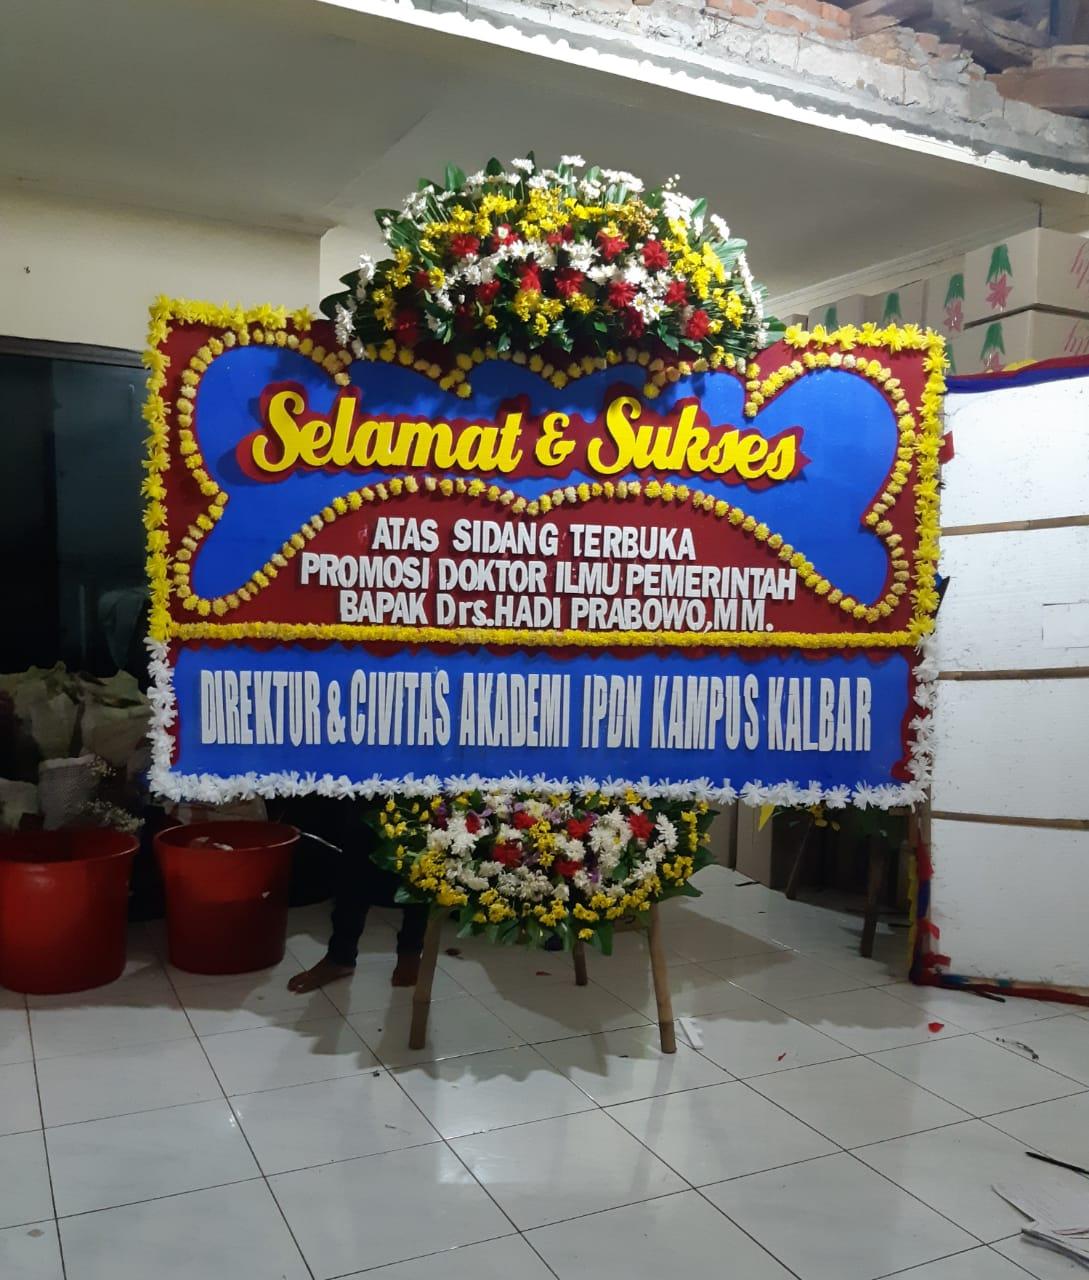 Toko Bunga Bintara Jaya Bekasi